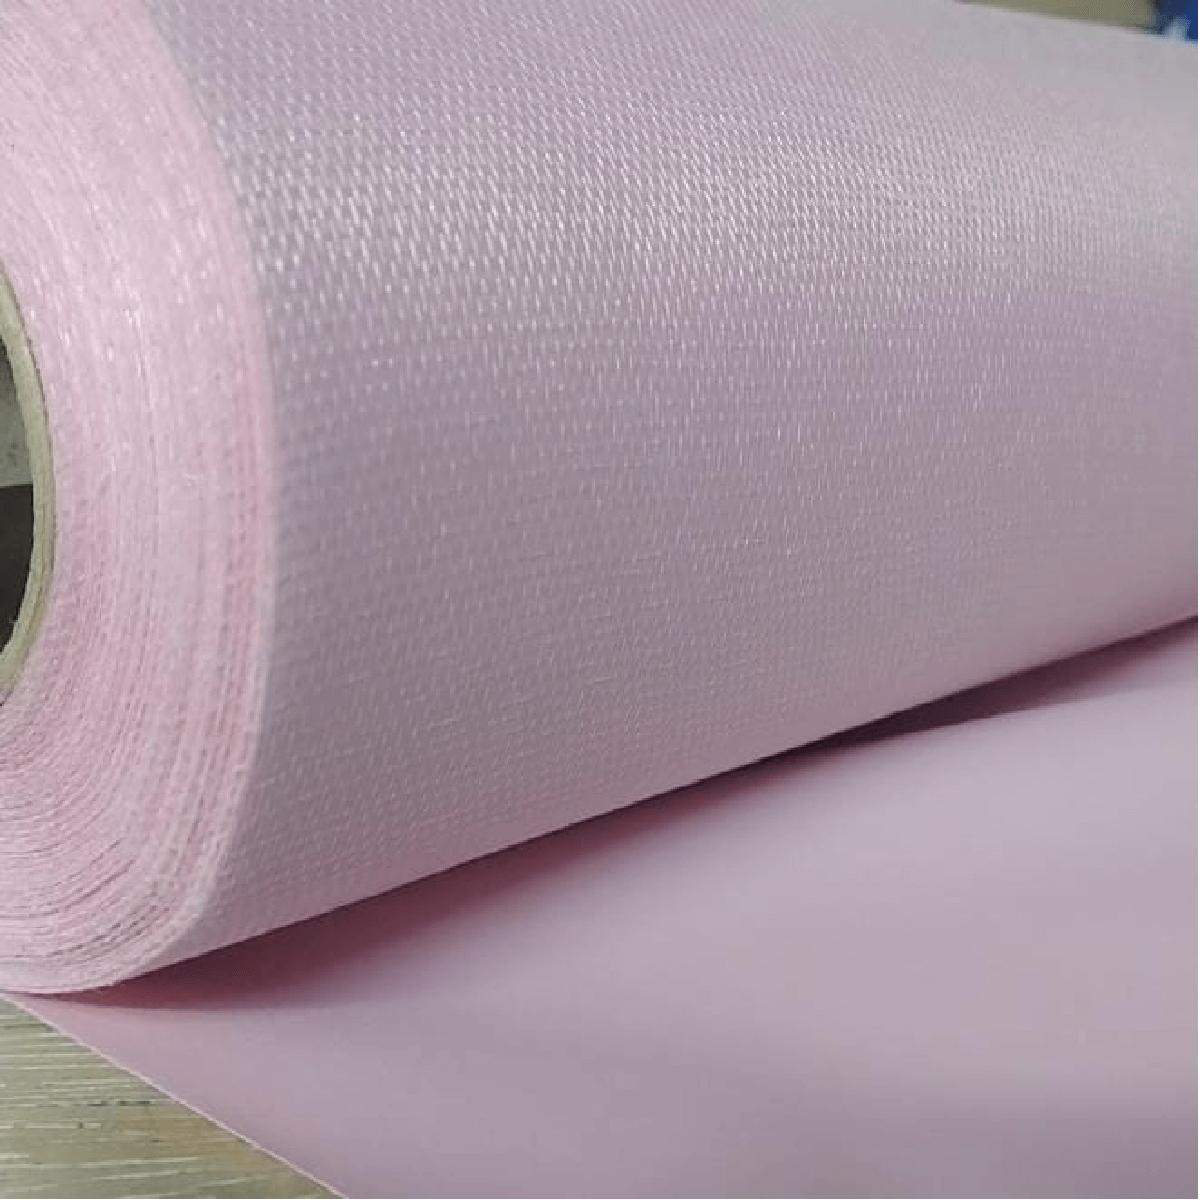 Kit 5m de Napa Bagum Div. Cores /METRO  - Miranda Colchões